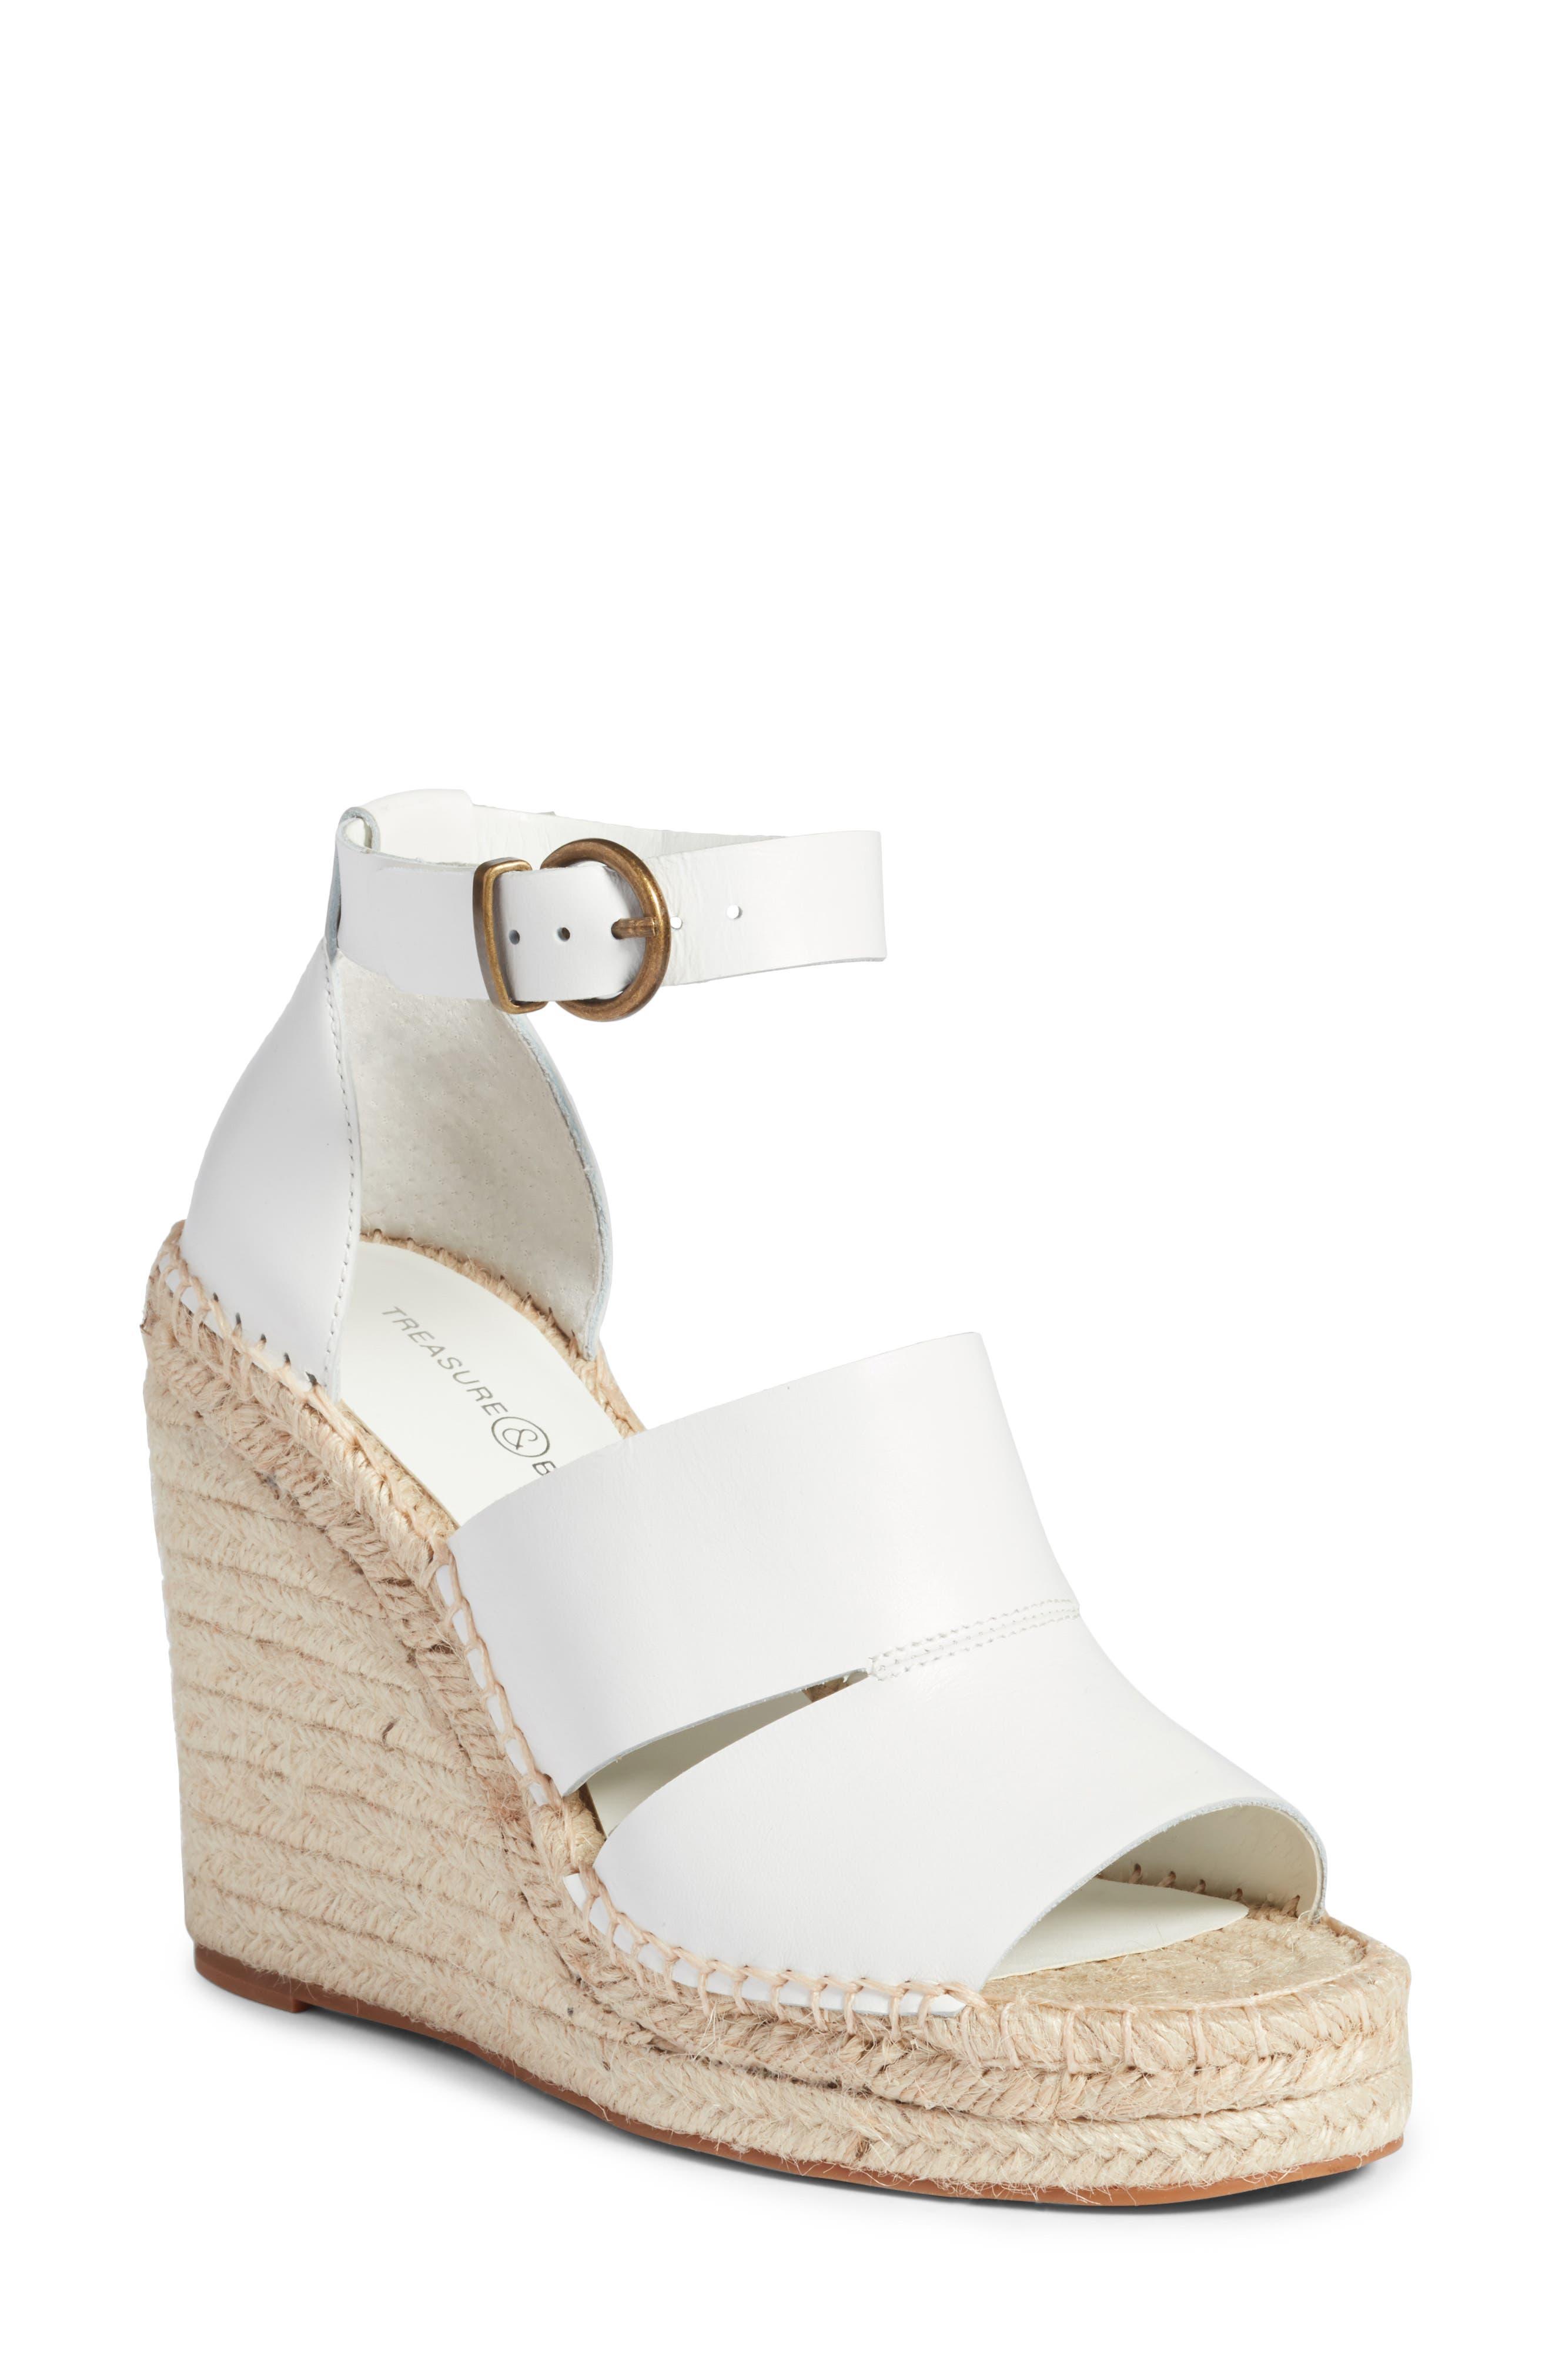 Alternate Image 1 Selected - Treasure & Bond Sannibel Platform Wedge Sandal (Women)